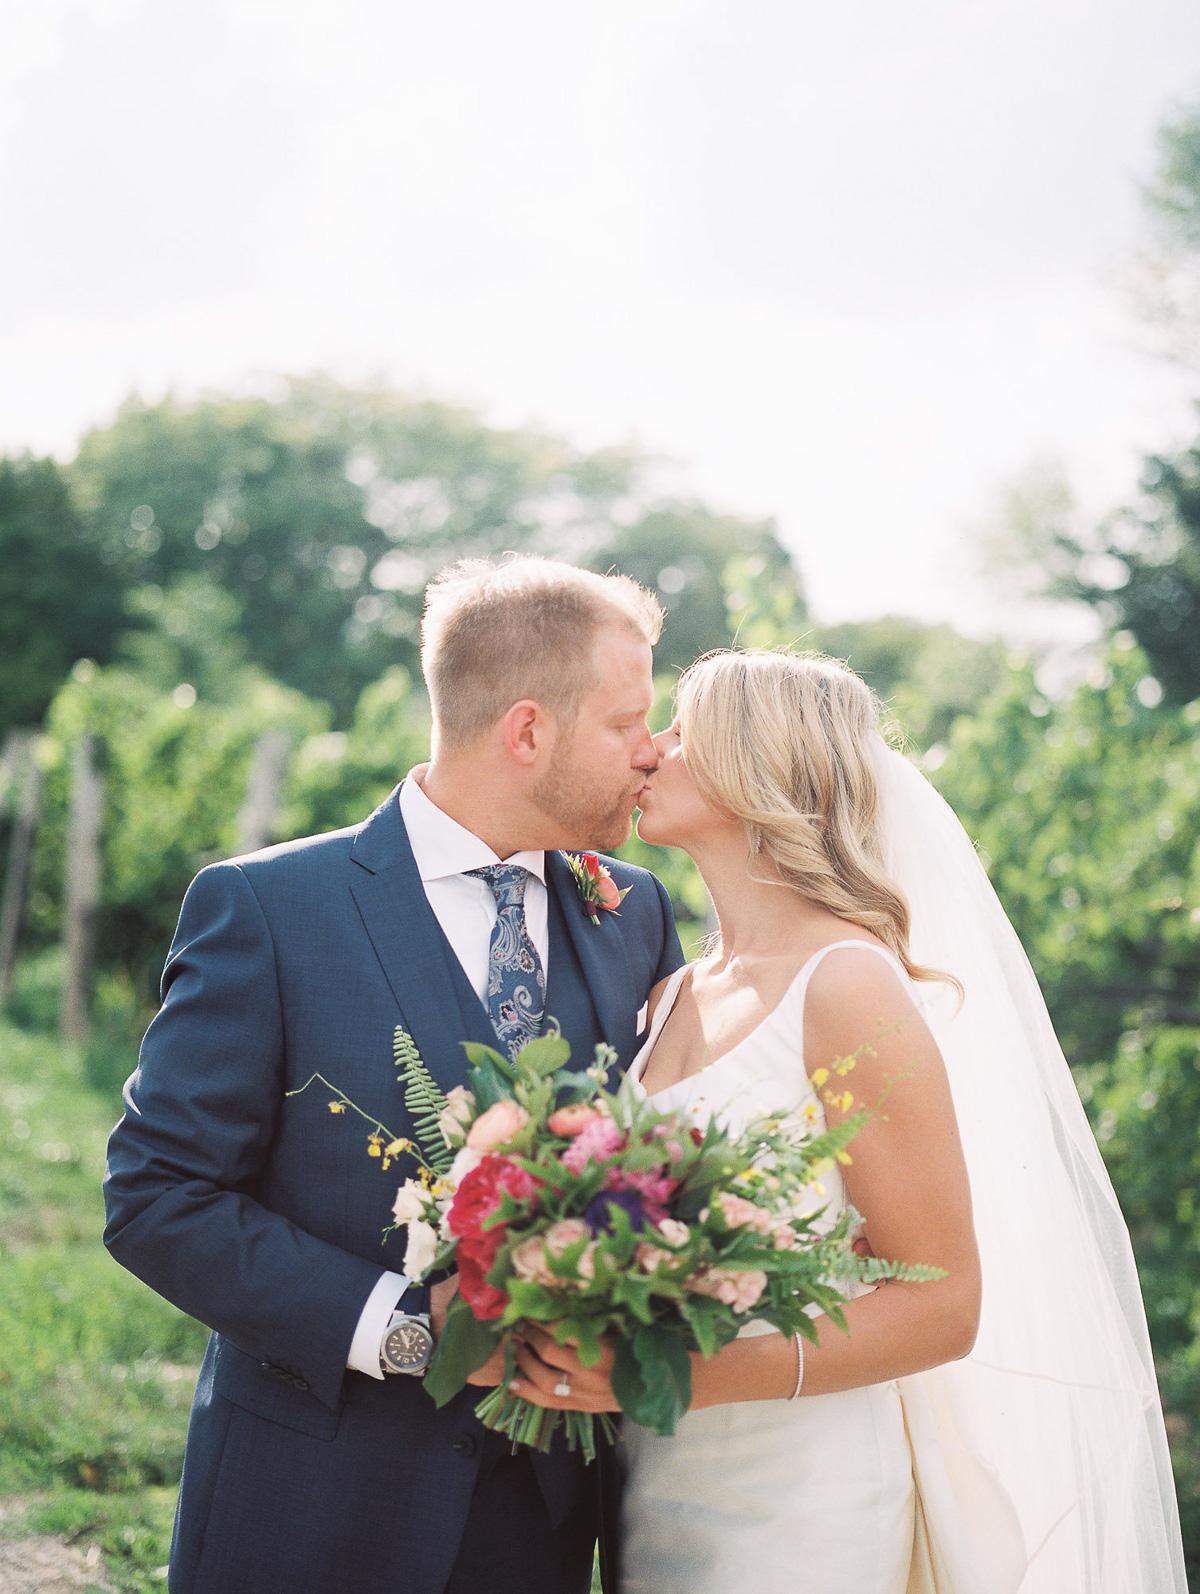 julia-park-photography-vineyard-bride-swish-list-stratus-winery-niagara-on-the-lake-wedding-25.jpg